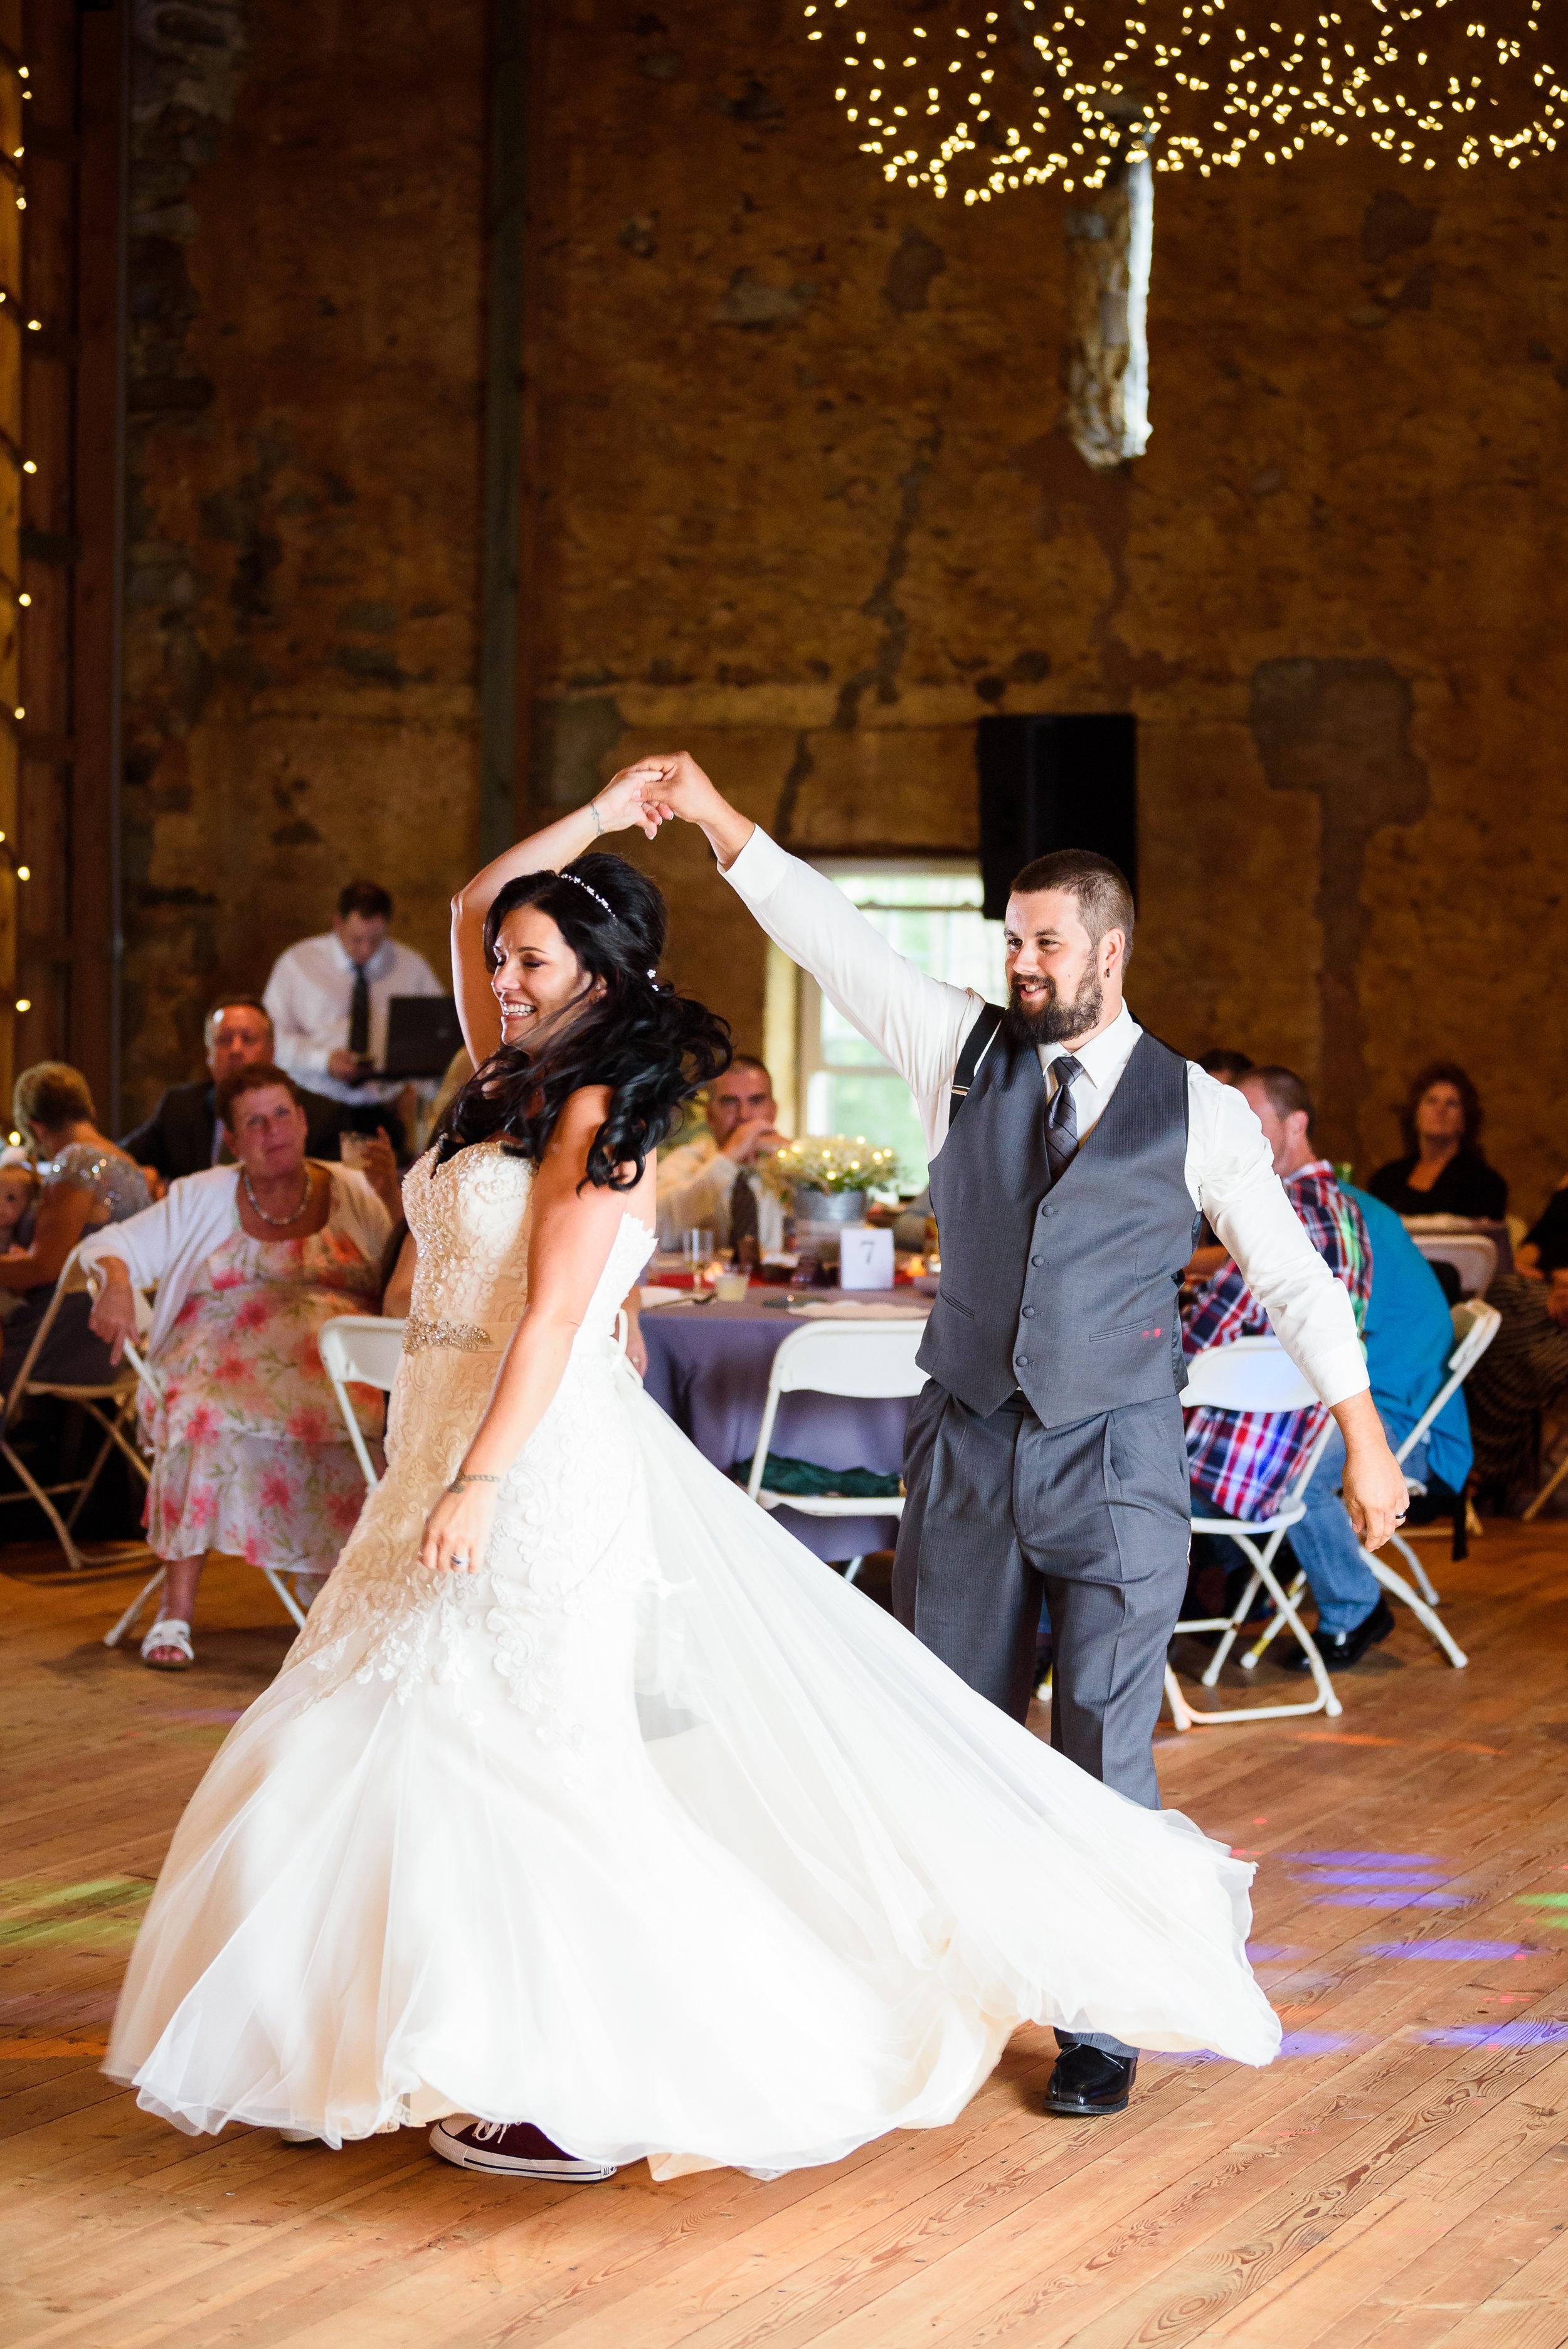 Heather-Jared-Wedding-Garcia-Photography-1357.jpg